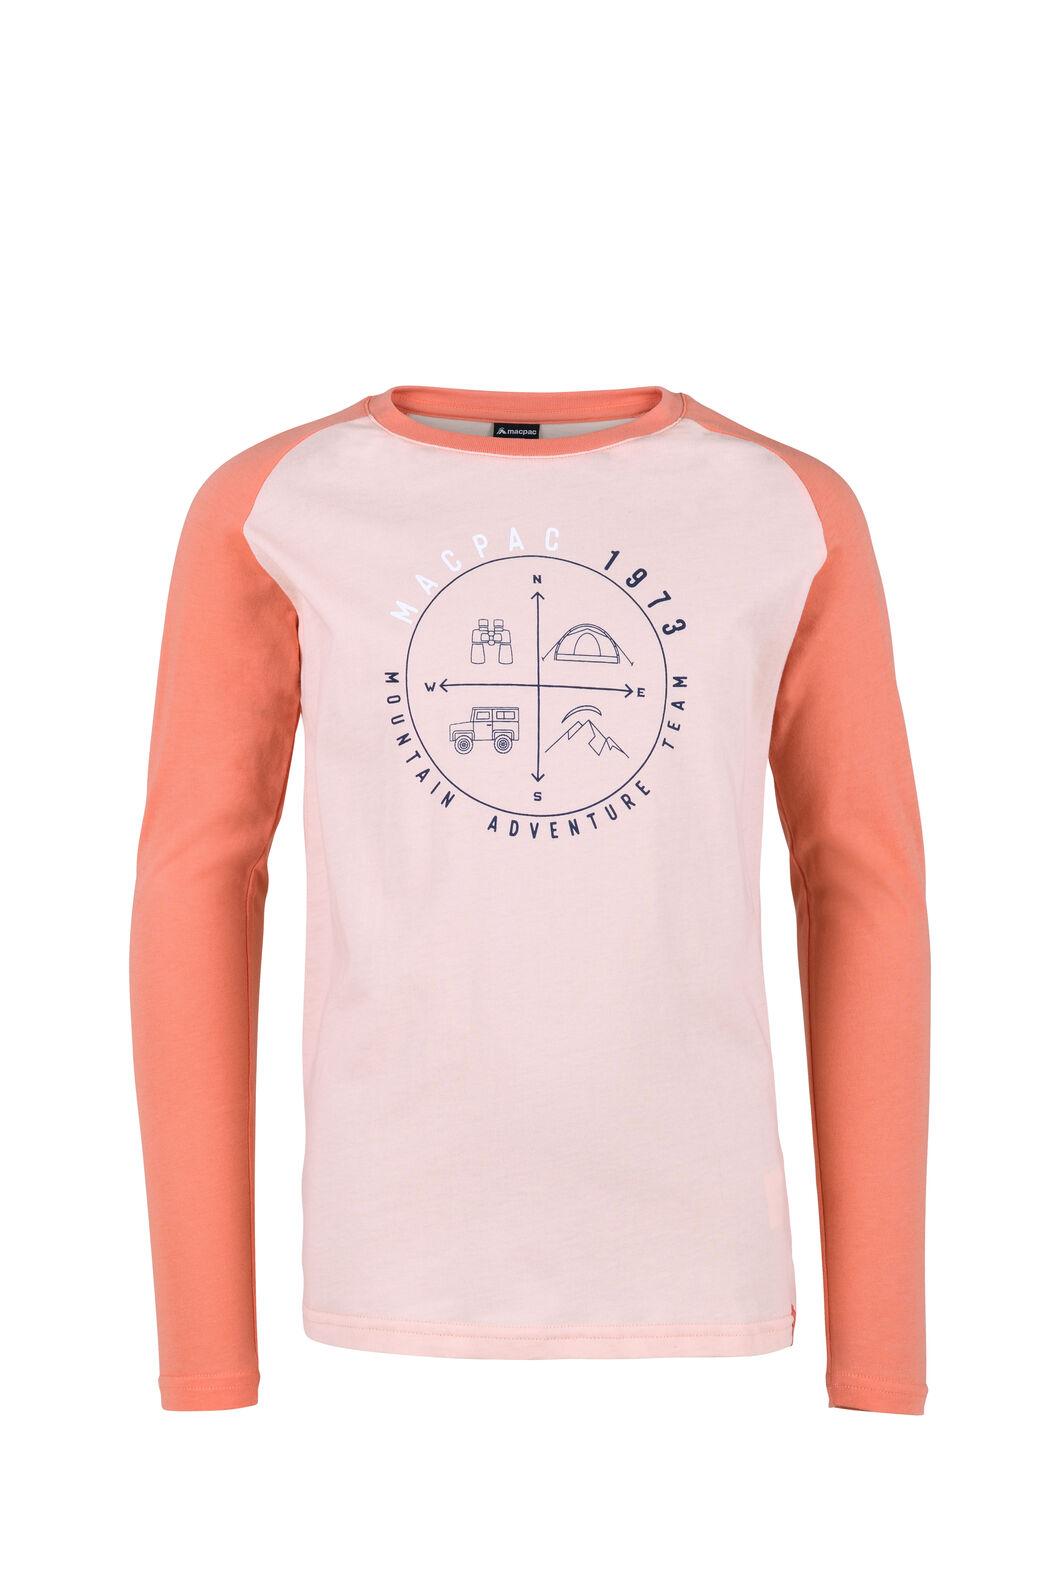 Macpac Compass Organic Long Sleeve Tee — Kids', Tropical Peach, hi-res